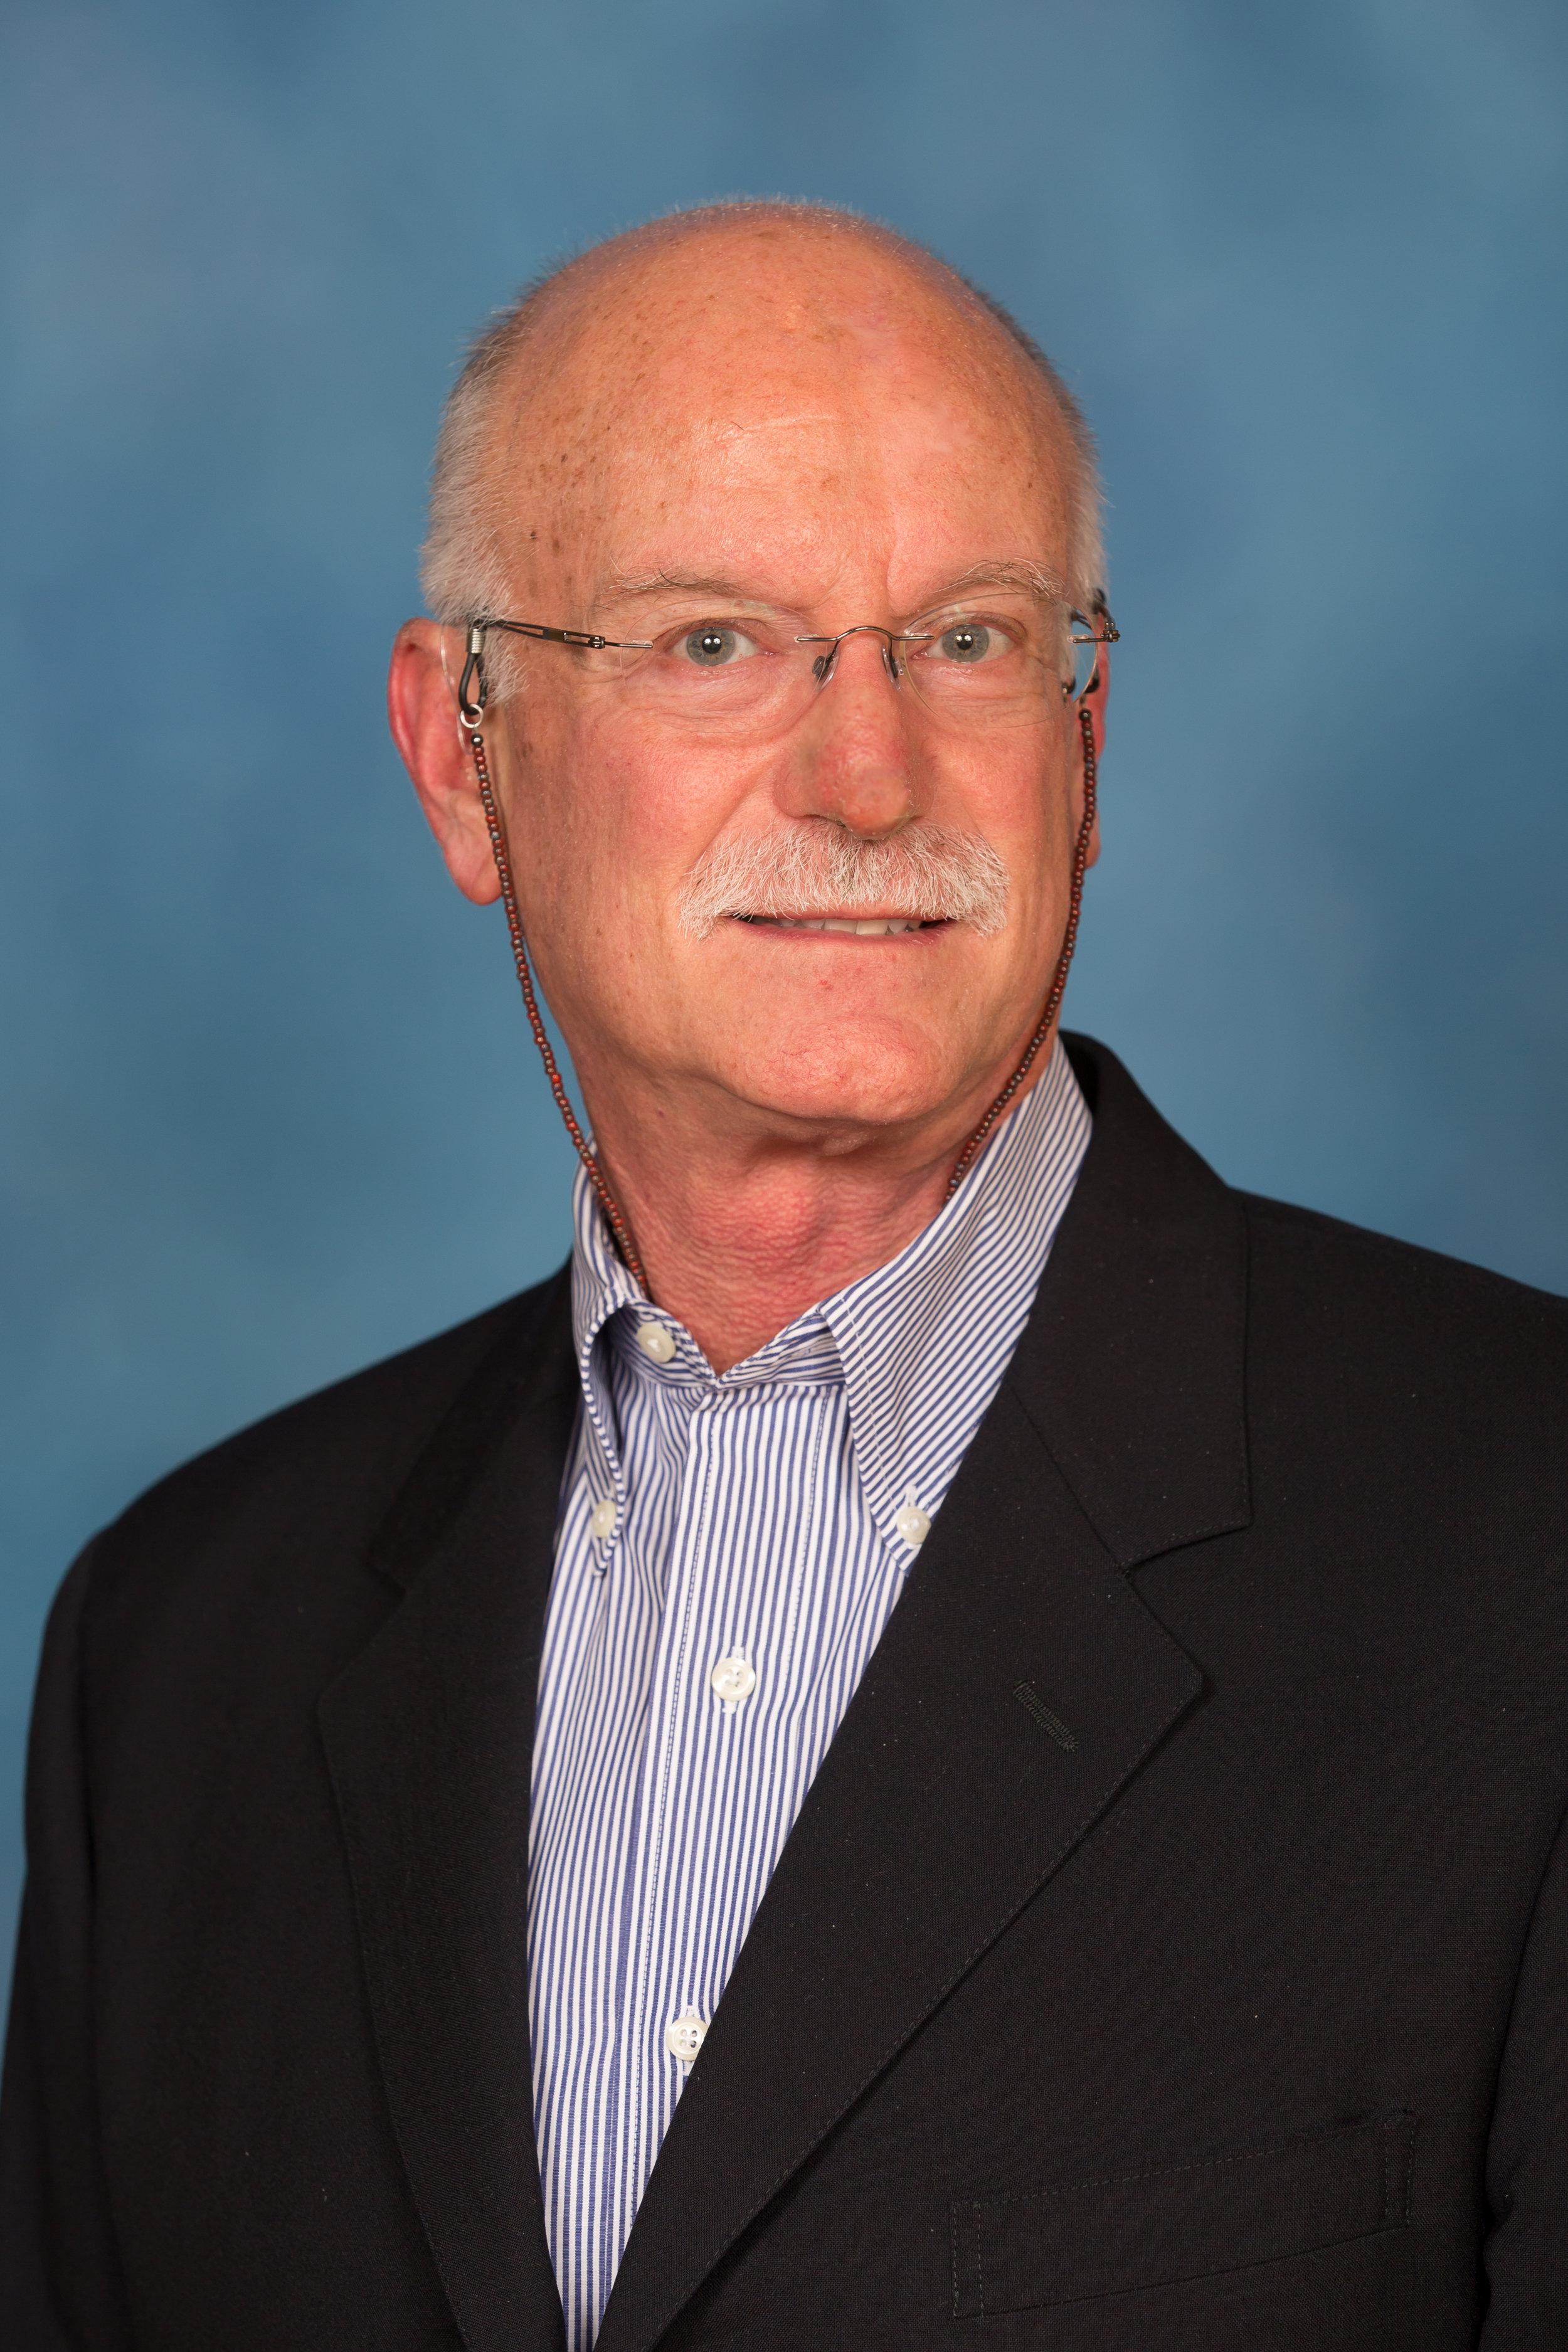 Dr. Alan Seidman - Vice President & Secretary